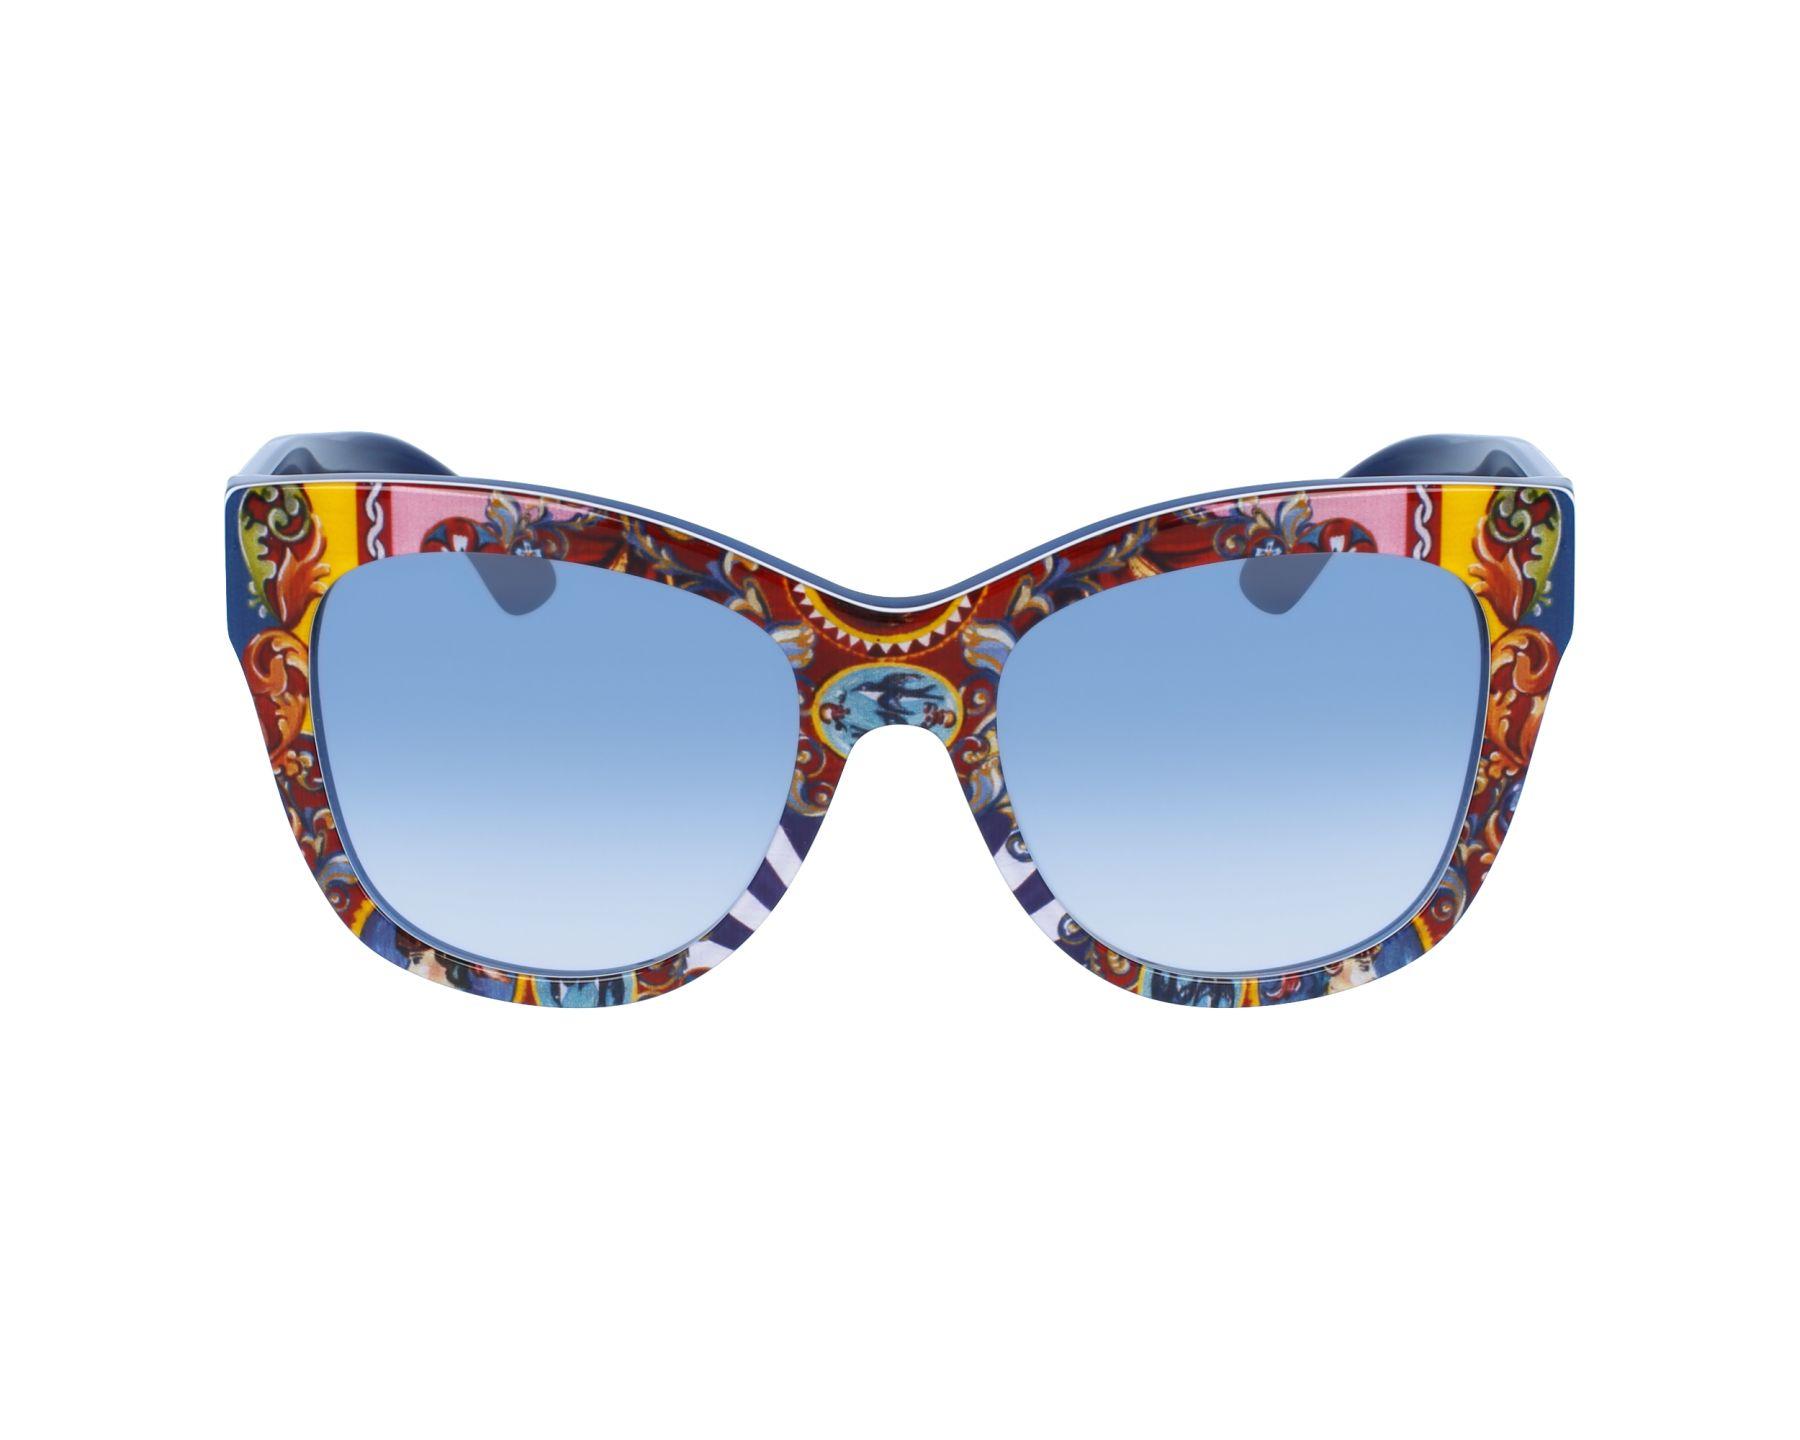 0adb04a33 thumbnail Sunglasses Dolce & Gabbana DG-4270 3036/19 - Red Blue profile view